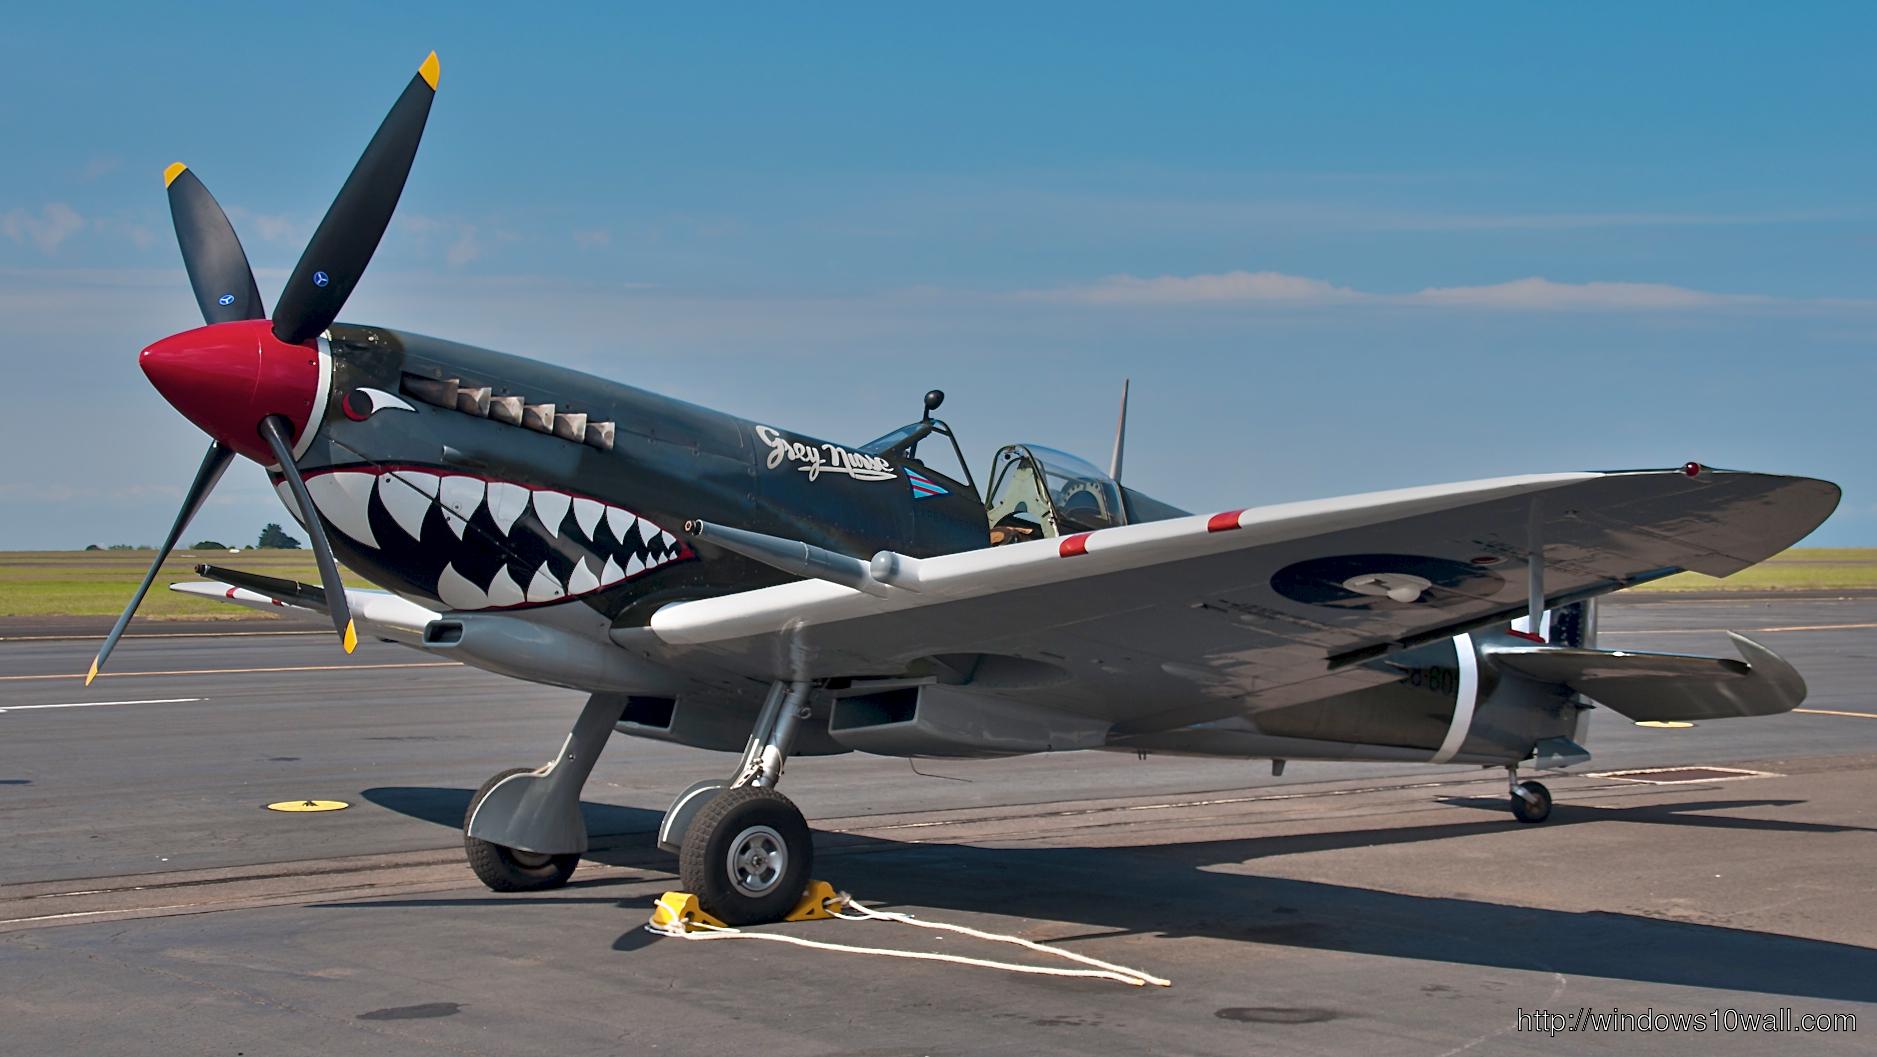 supermarine-spitfire-plane